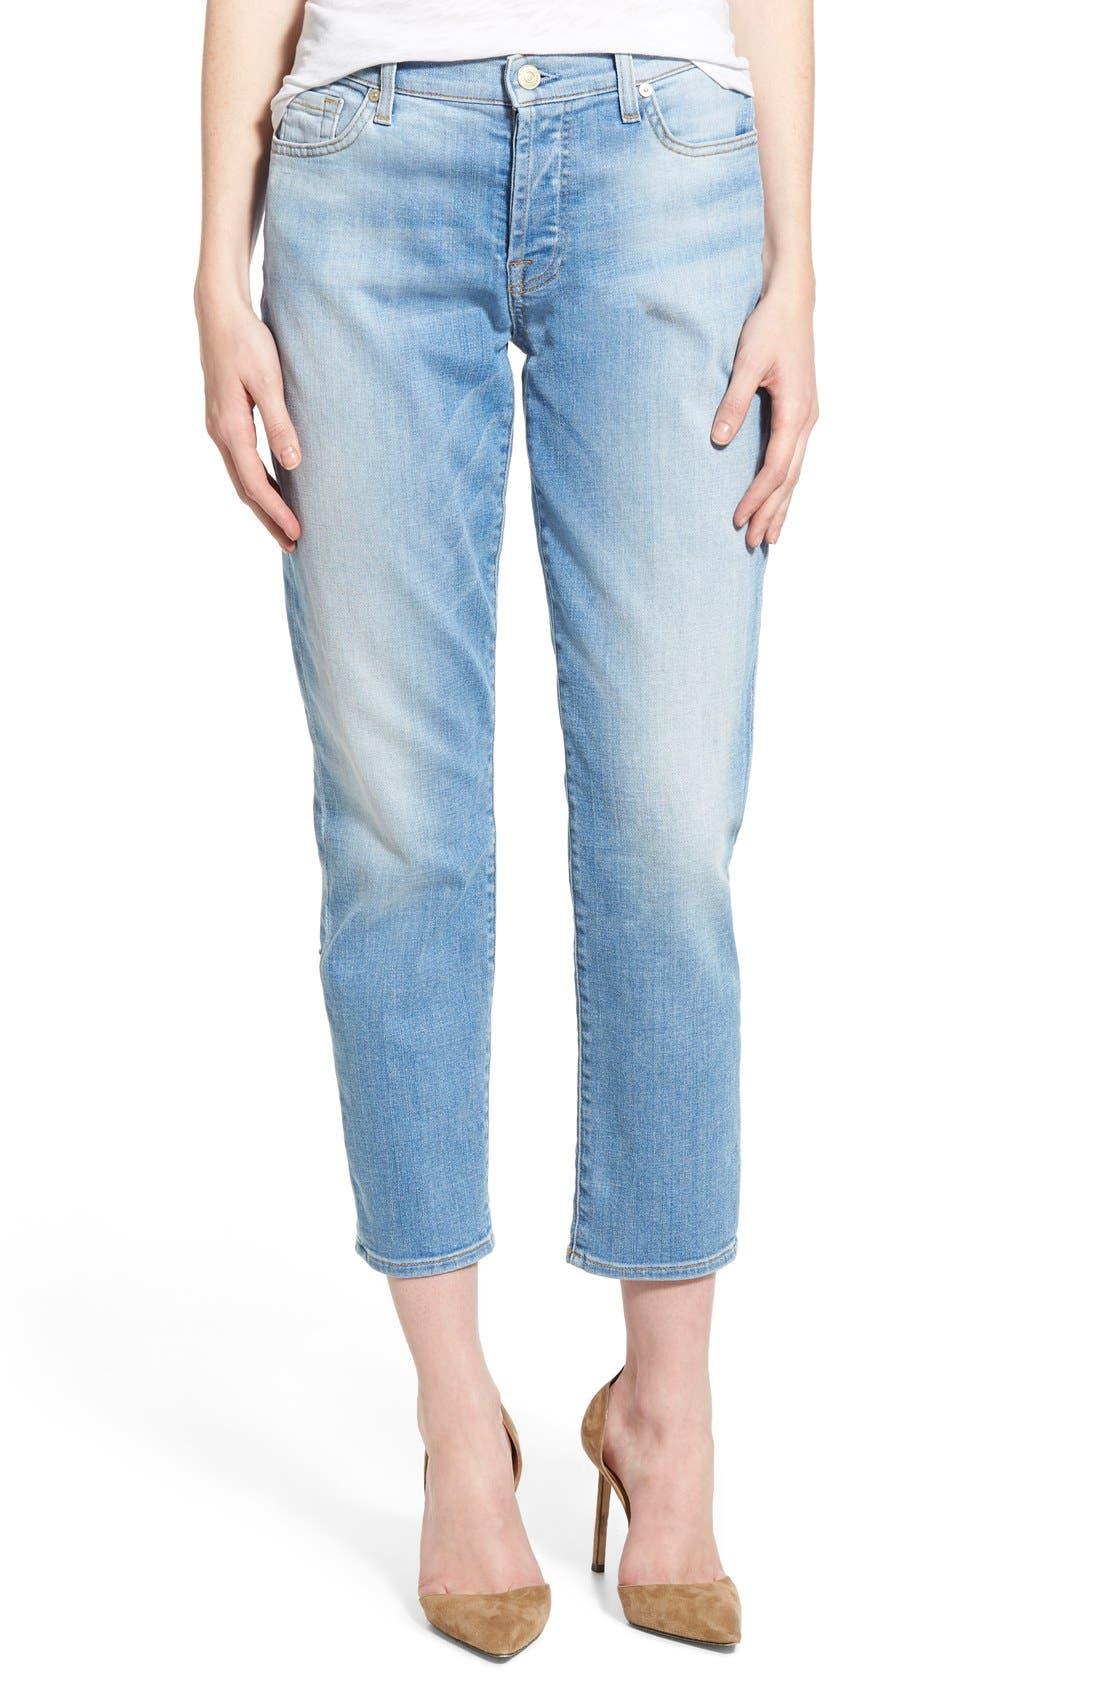 Alternate Image 1 Selected - 7 For All Mankind® 'Josefina' Mid Rise Boyfriend Jeans (Mediterranean Sky)